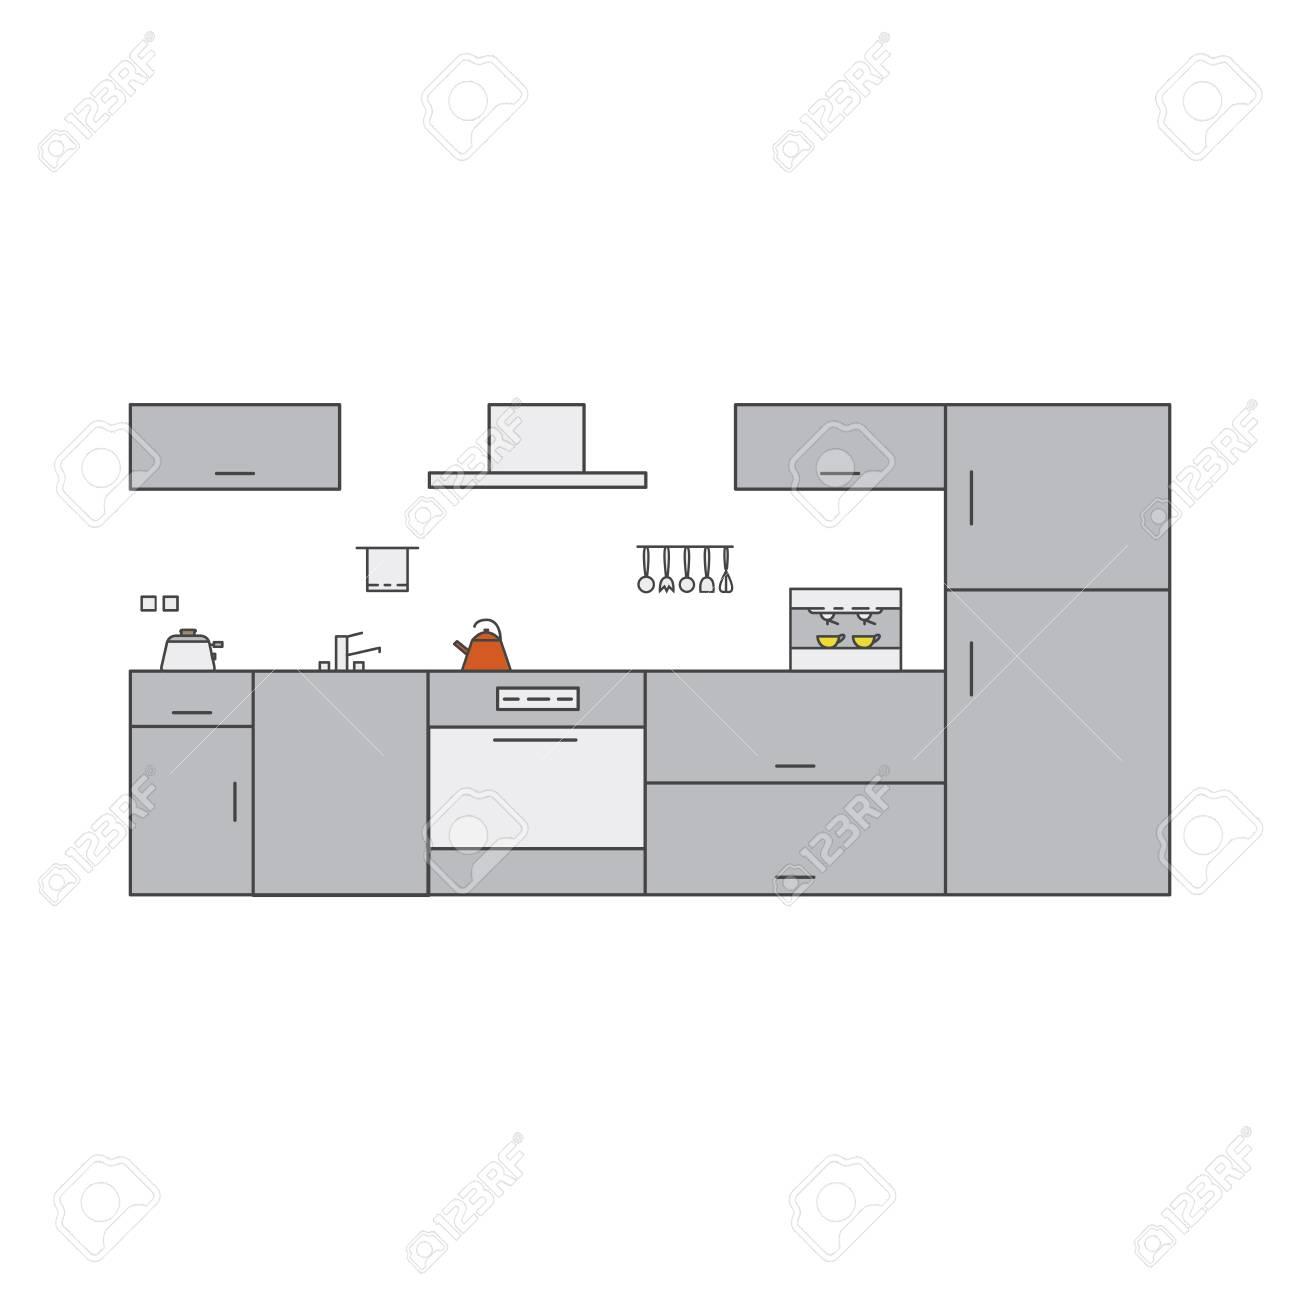 Kitchen Interior In High Tech Style Interior Design Concept